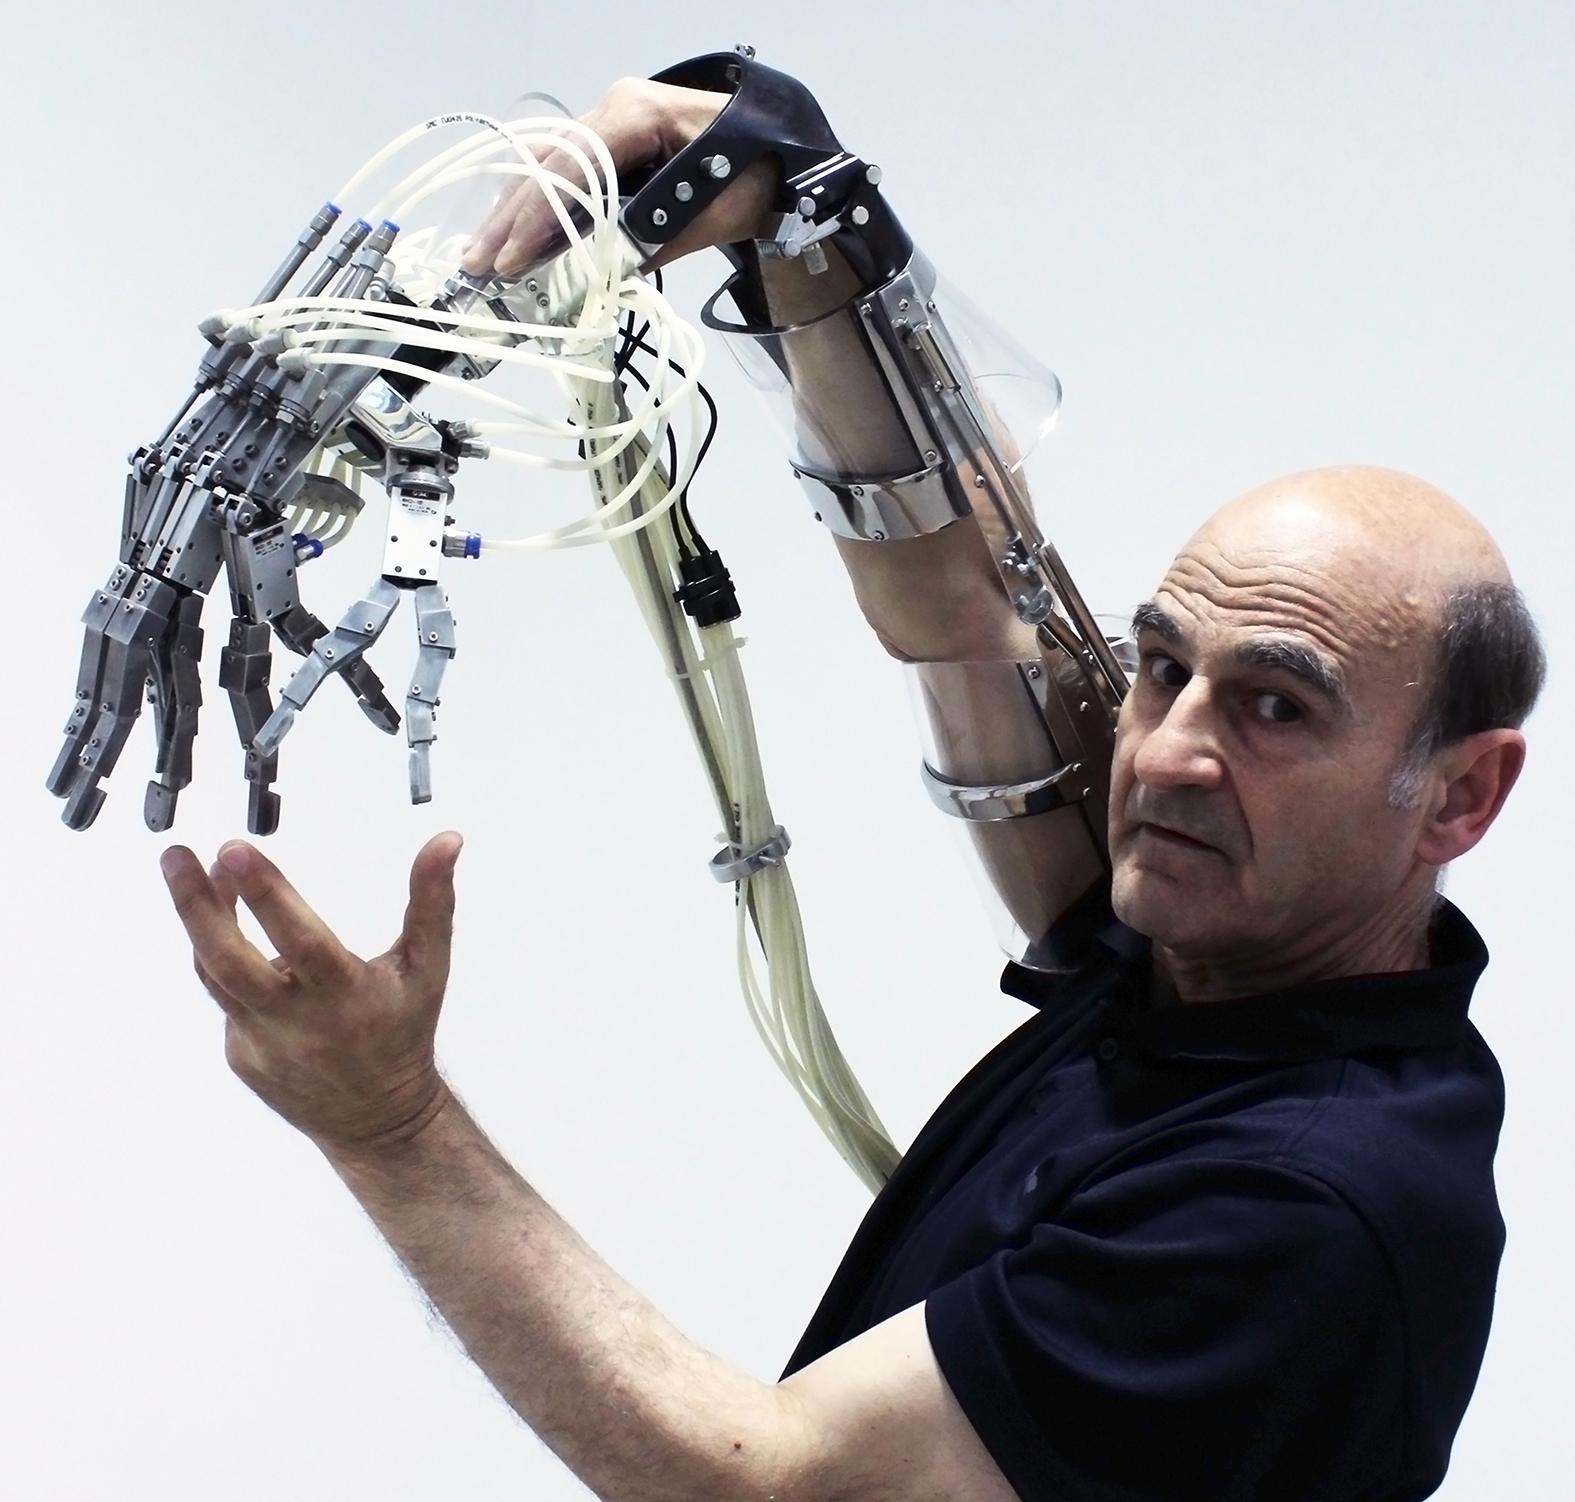 Extended Arm, Scott Livesey Galleries, Melbourne 2011. Photographer - Dean Winter